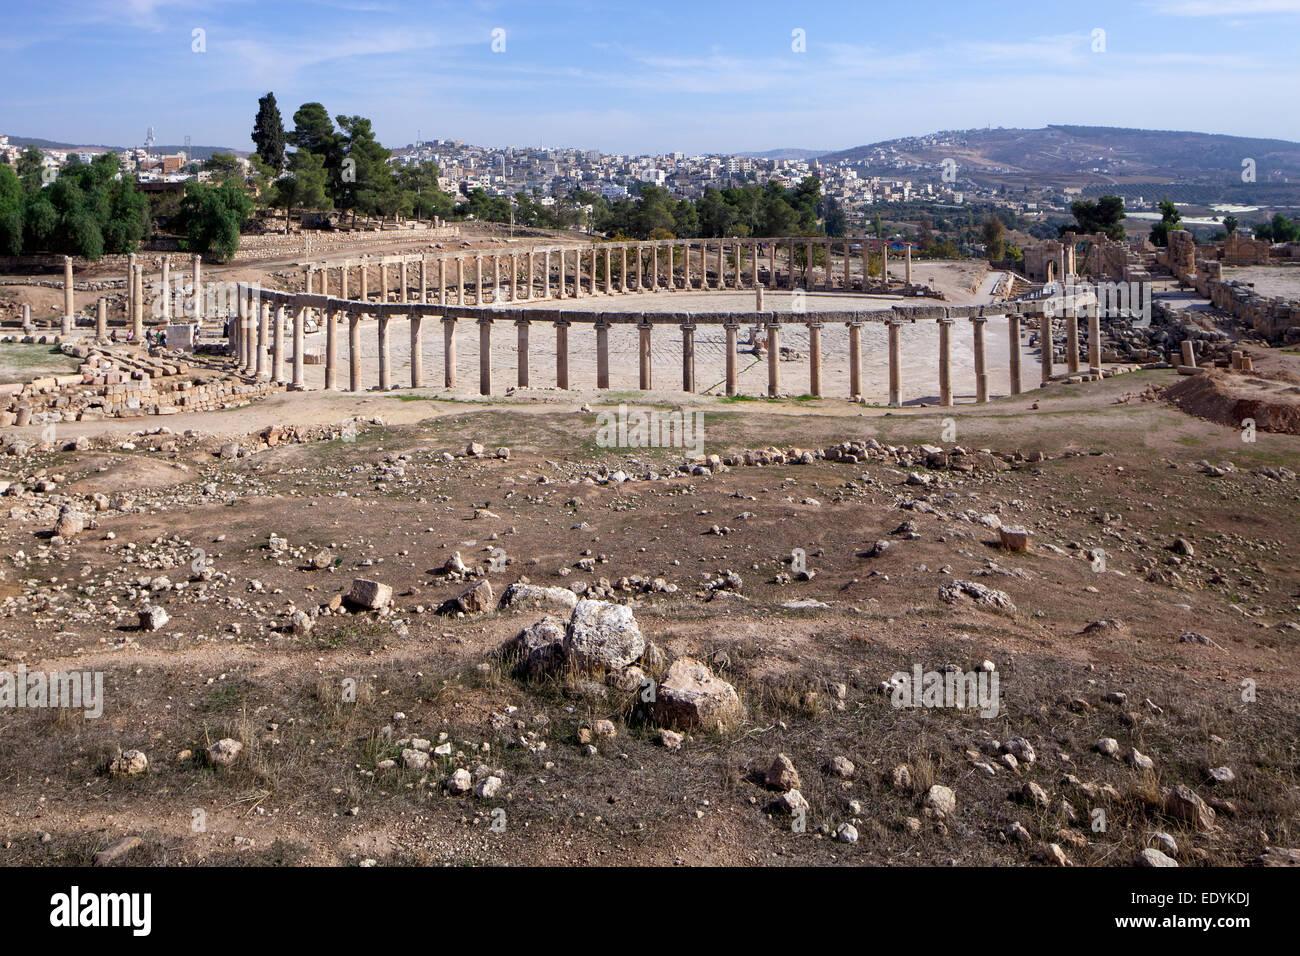 Oval forum, ancient Roman city of Jerash, part of the Decapolis, Jerash, Jerash Governorate, Jordan - Stock Image